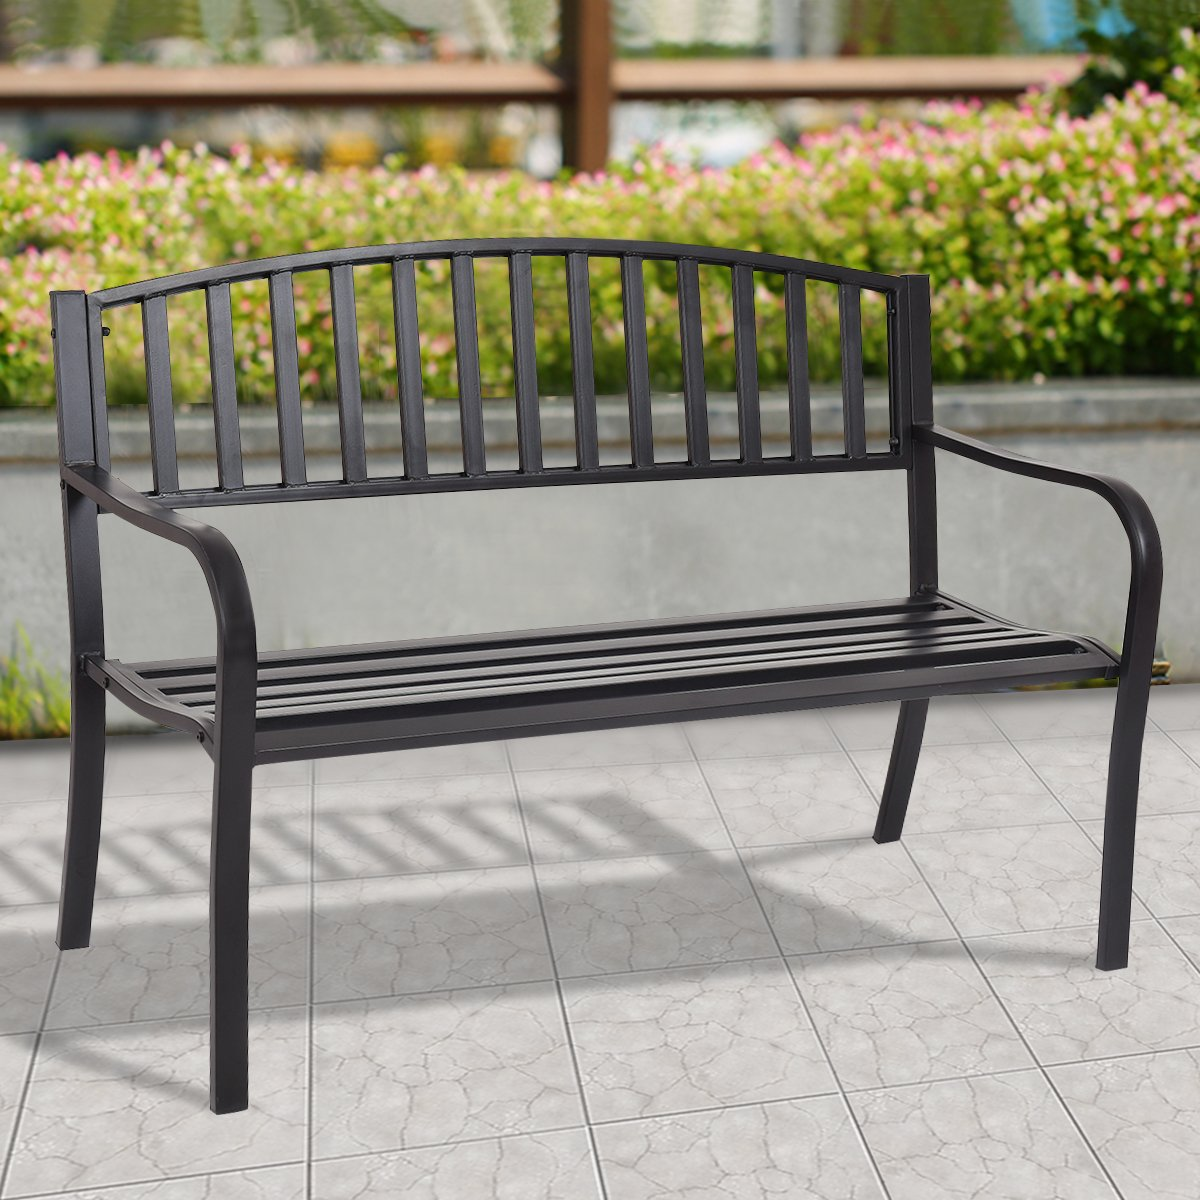 Giantex 50 Patio Garden Bench Loveseats Park Yard Furniture Decor Cast Iron Frame Black Black Style 2